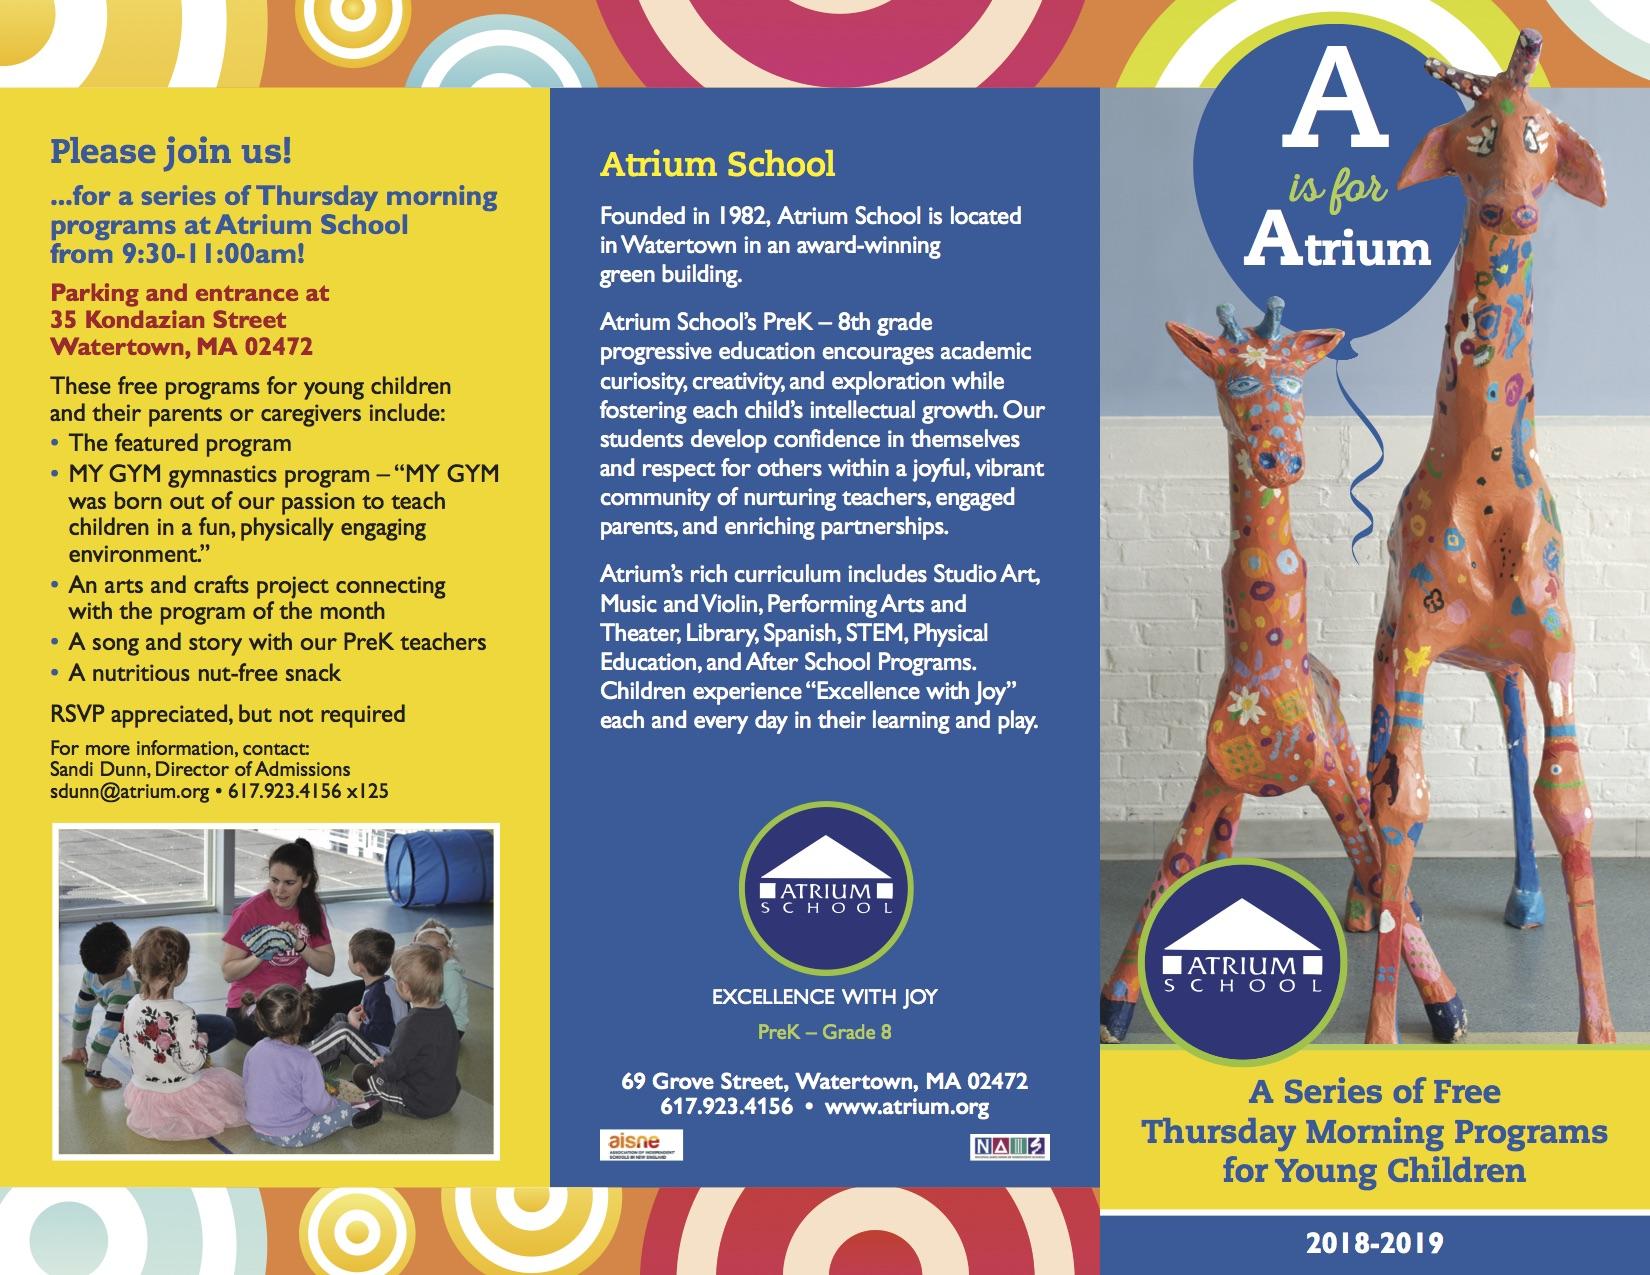 A is for Atrium Brochure 1.jpg